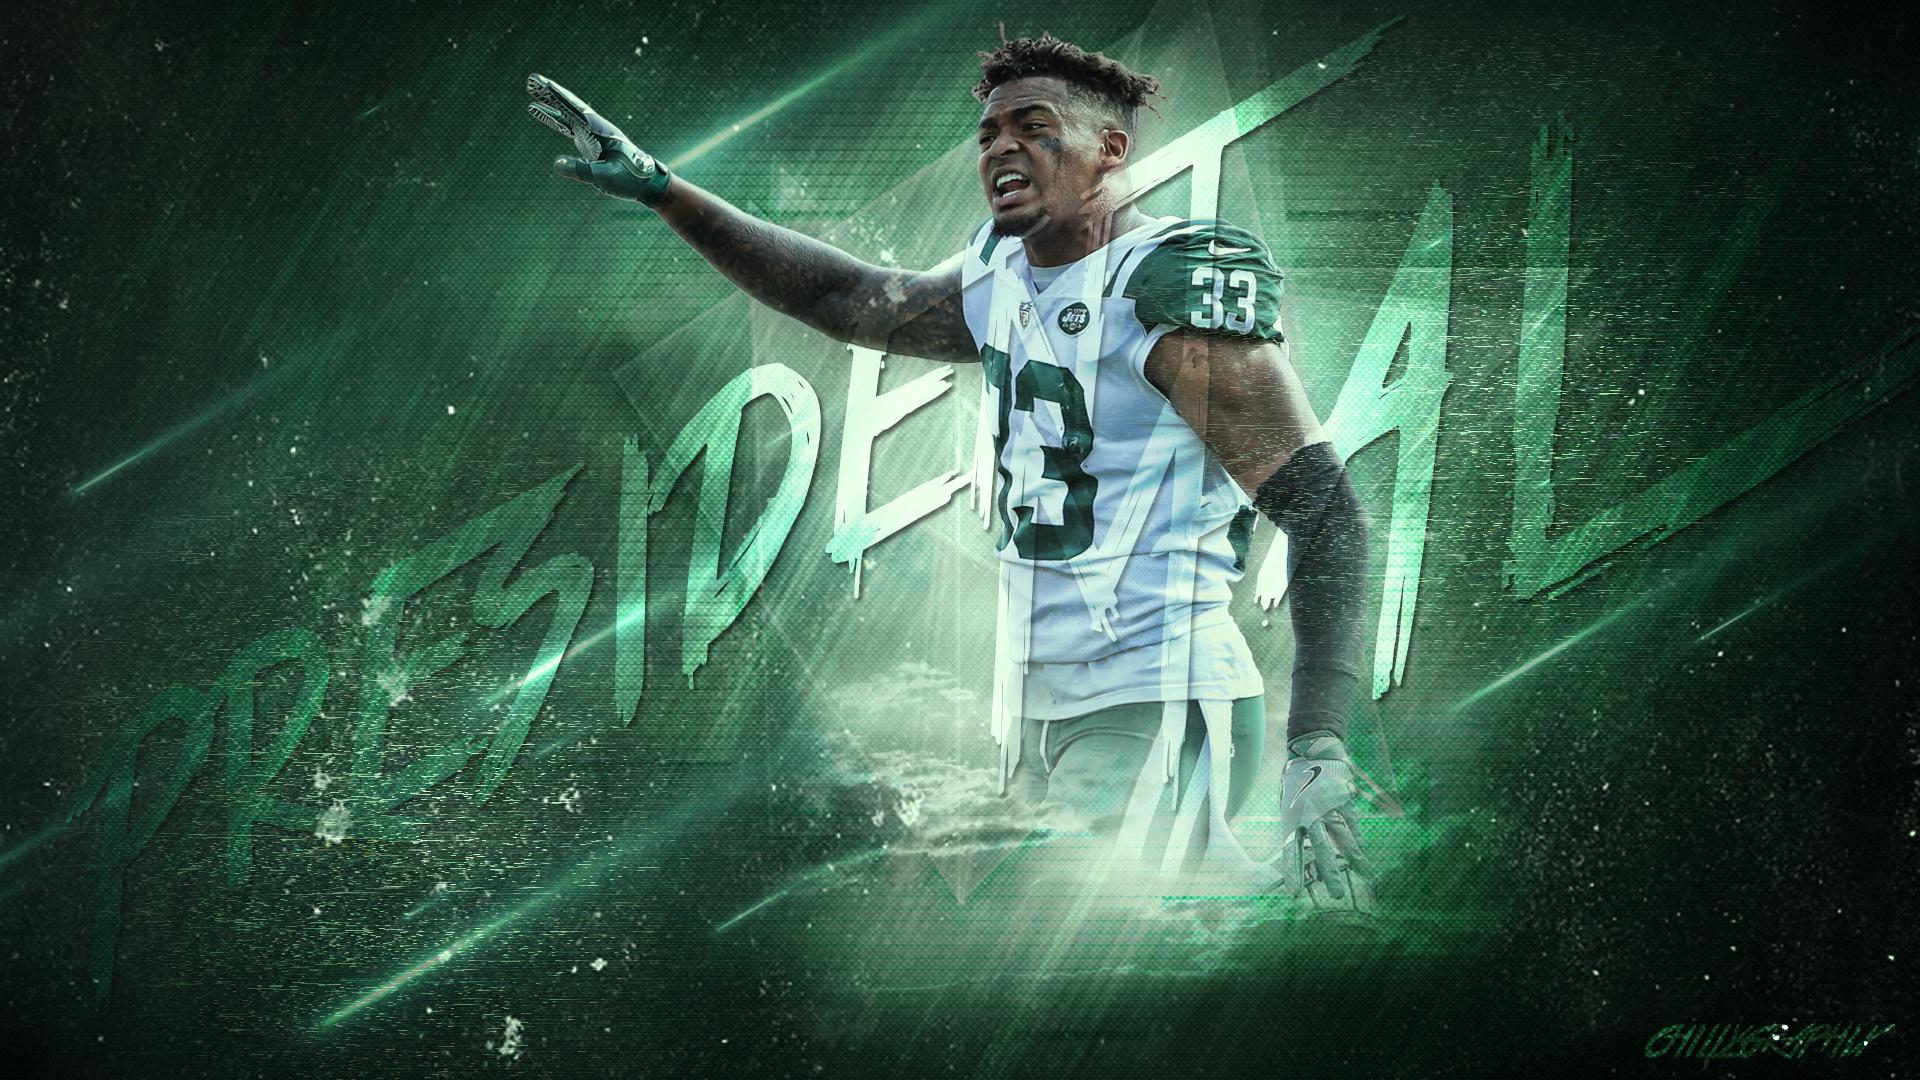 Jamal Adams Wallpaper New York Jets Football Jamal Adams New York Jets